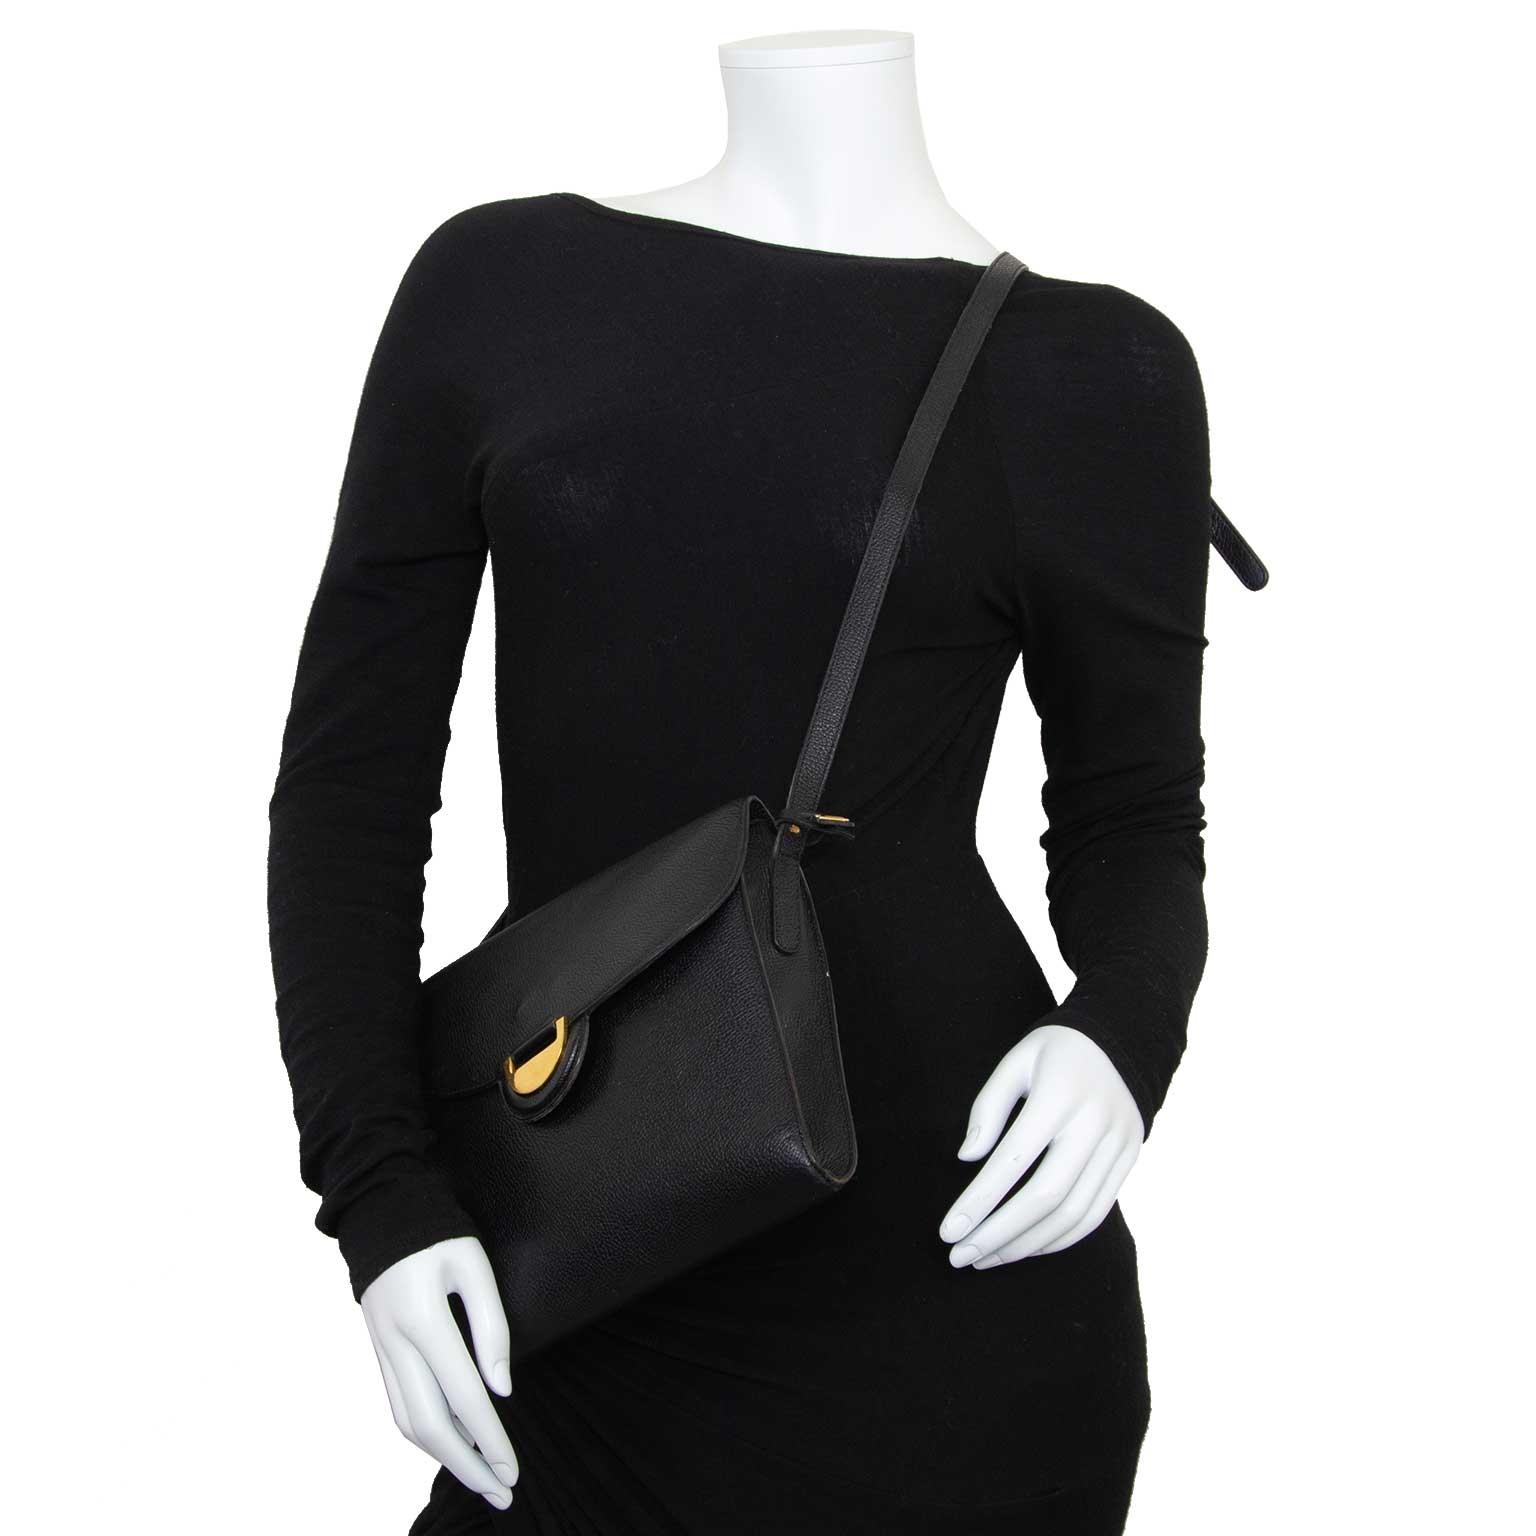 delvaux black crossbody bag now for sale at labellov vintage fashion webshop belgium